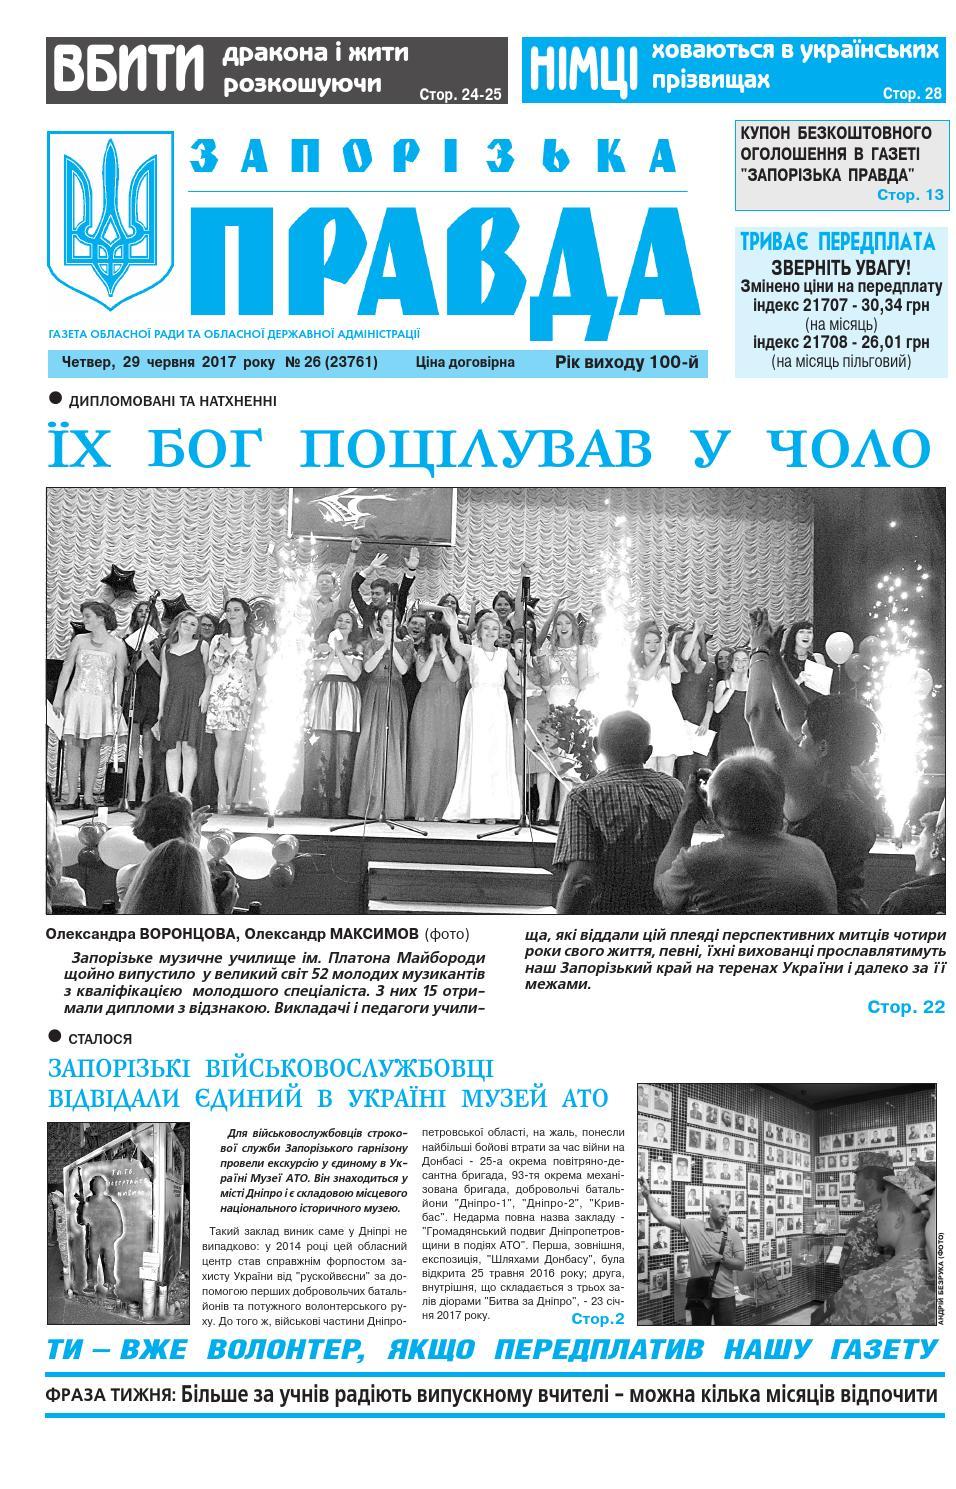 29 06 17 by Запорізька правда - issuu e2f5c5591008e